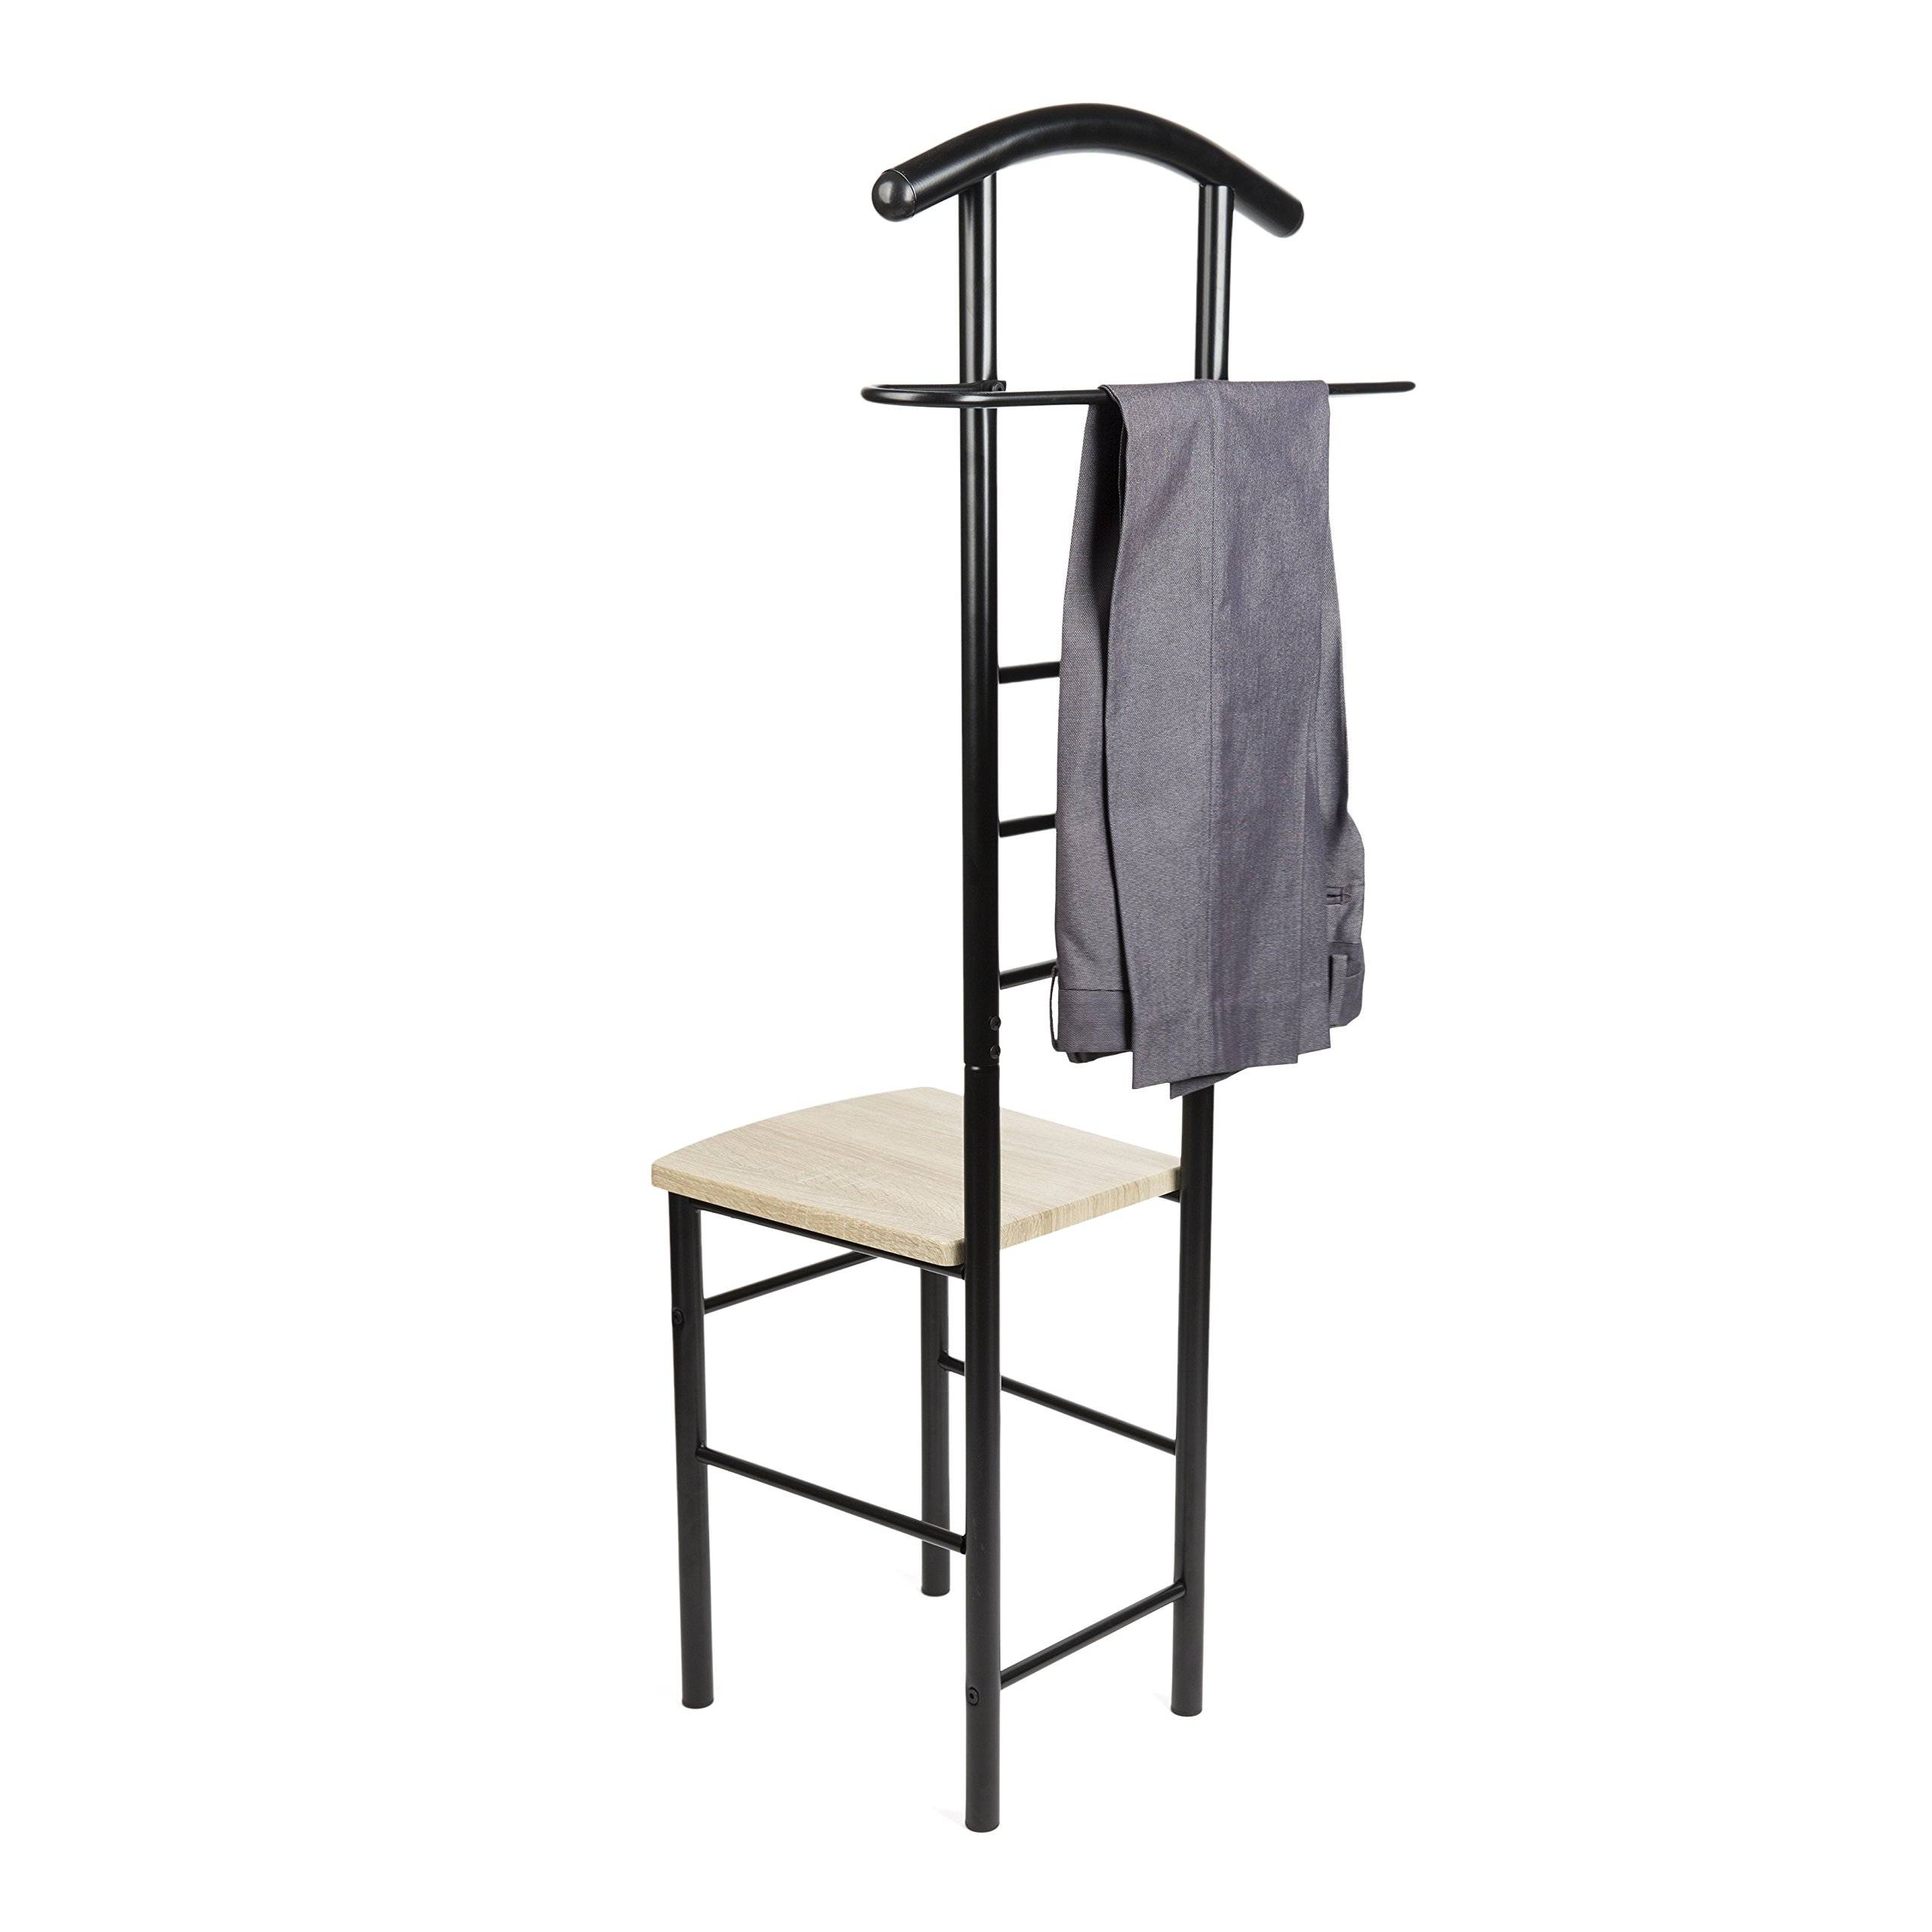 Danya B. Black Chair Valet